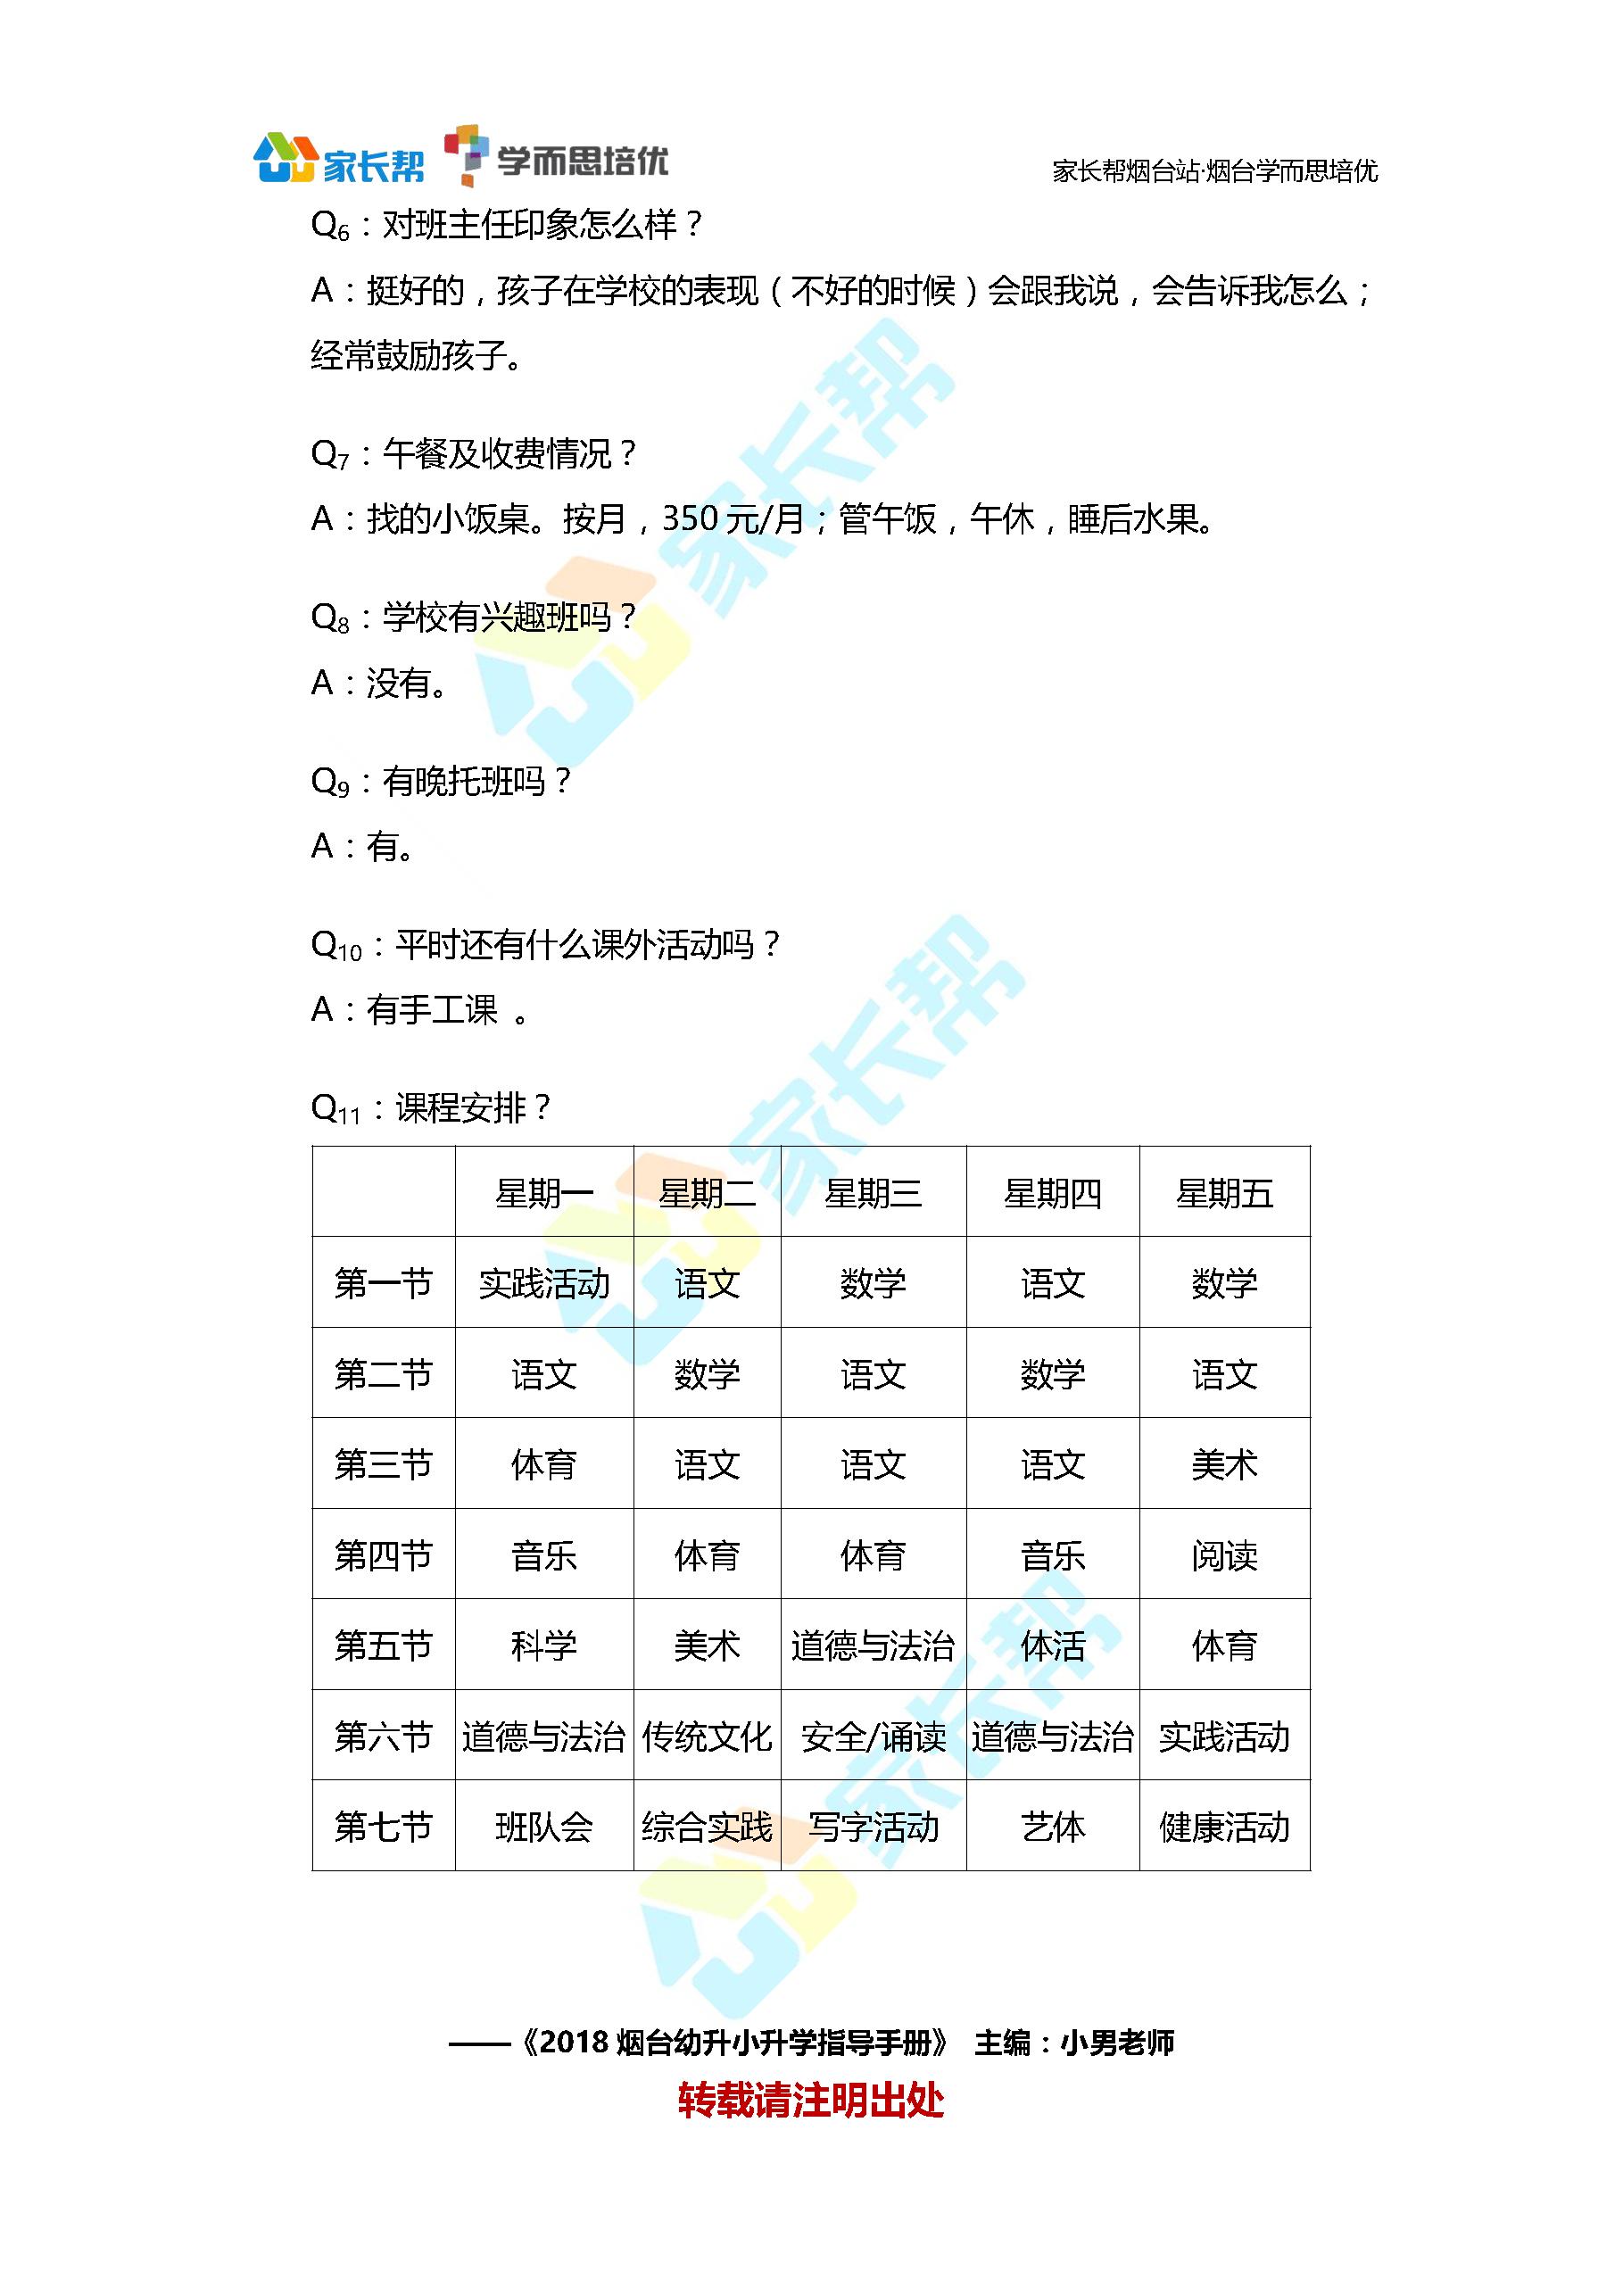 文档1_页面_2.png